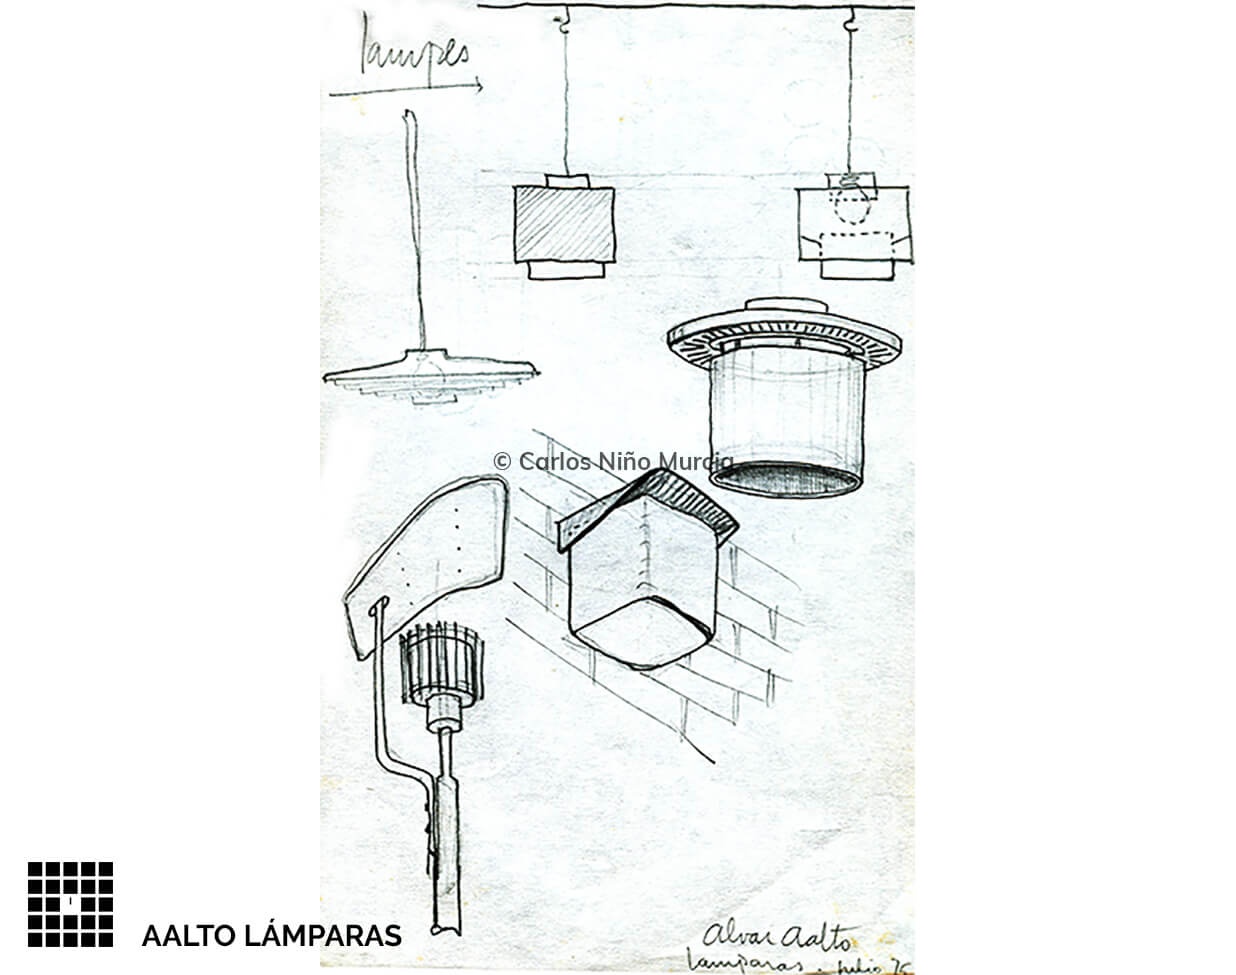 dibujos-diseno-34